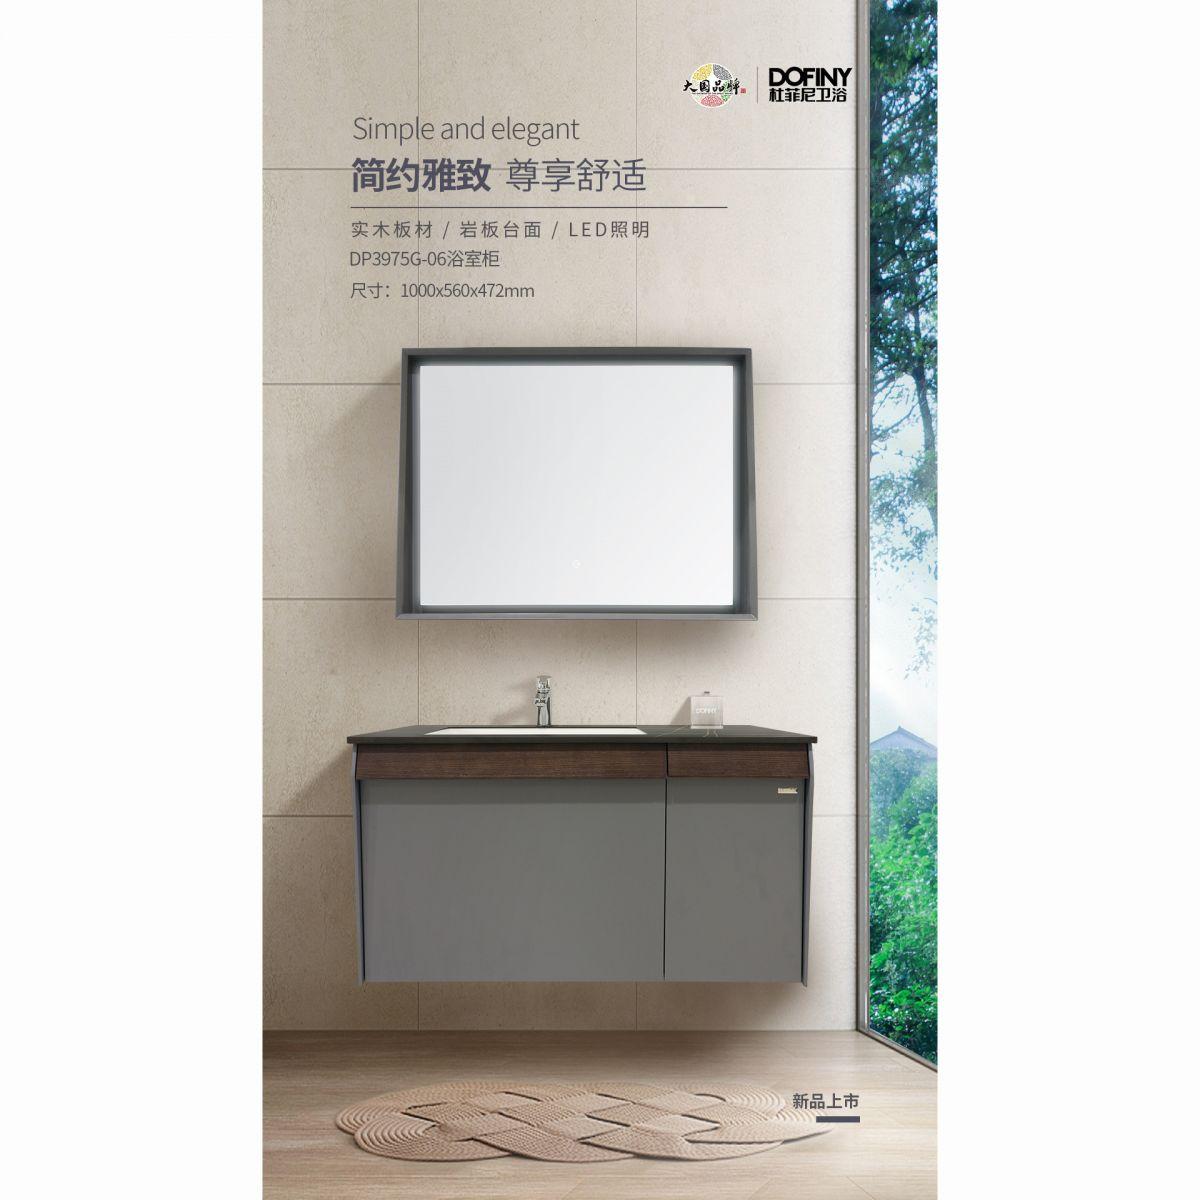 DP4907CG-06浴室柜